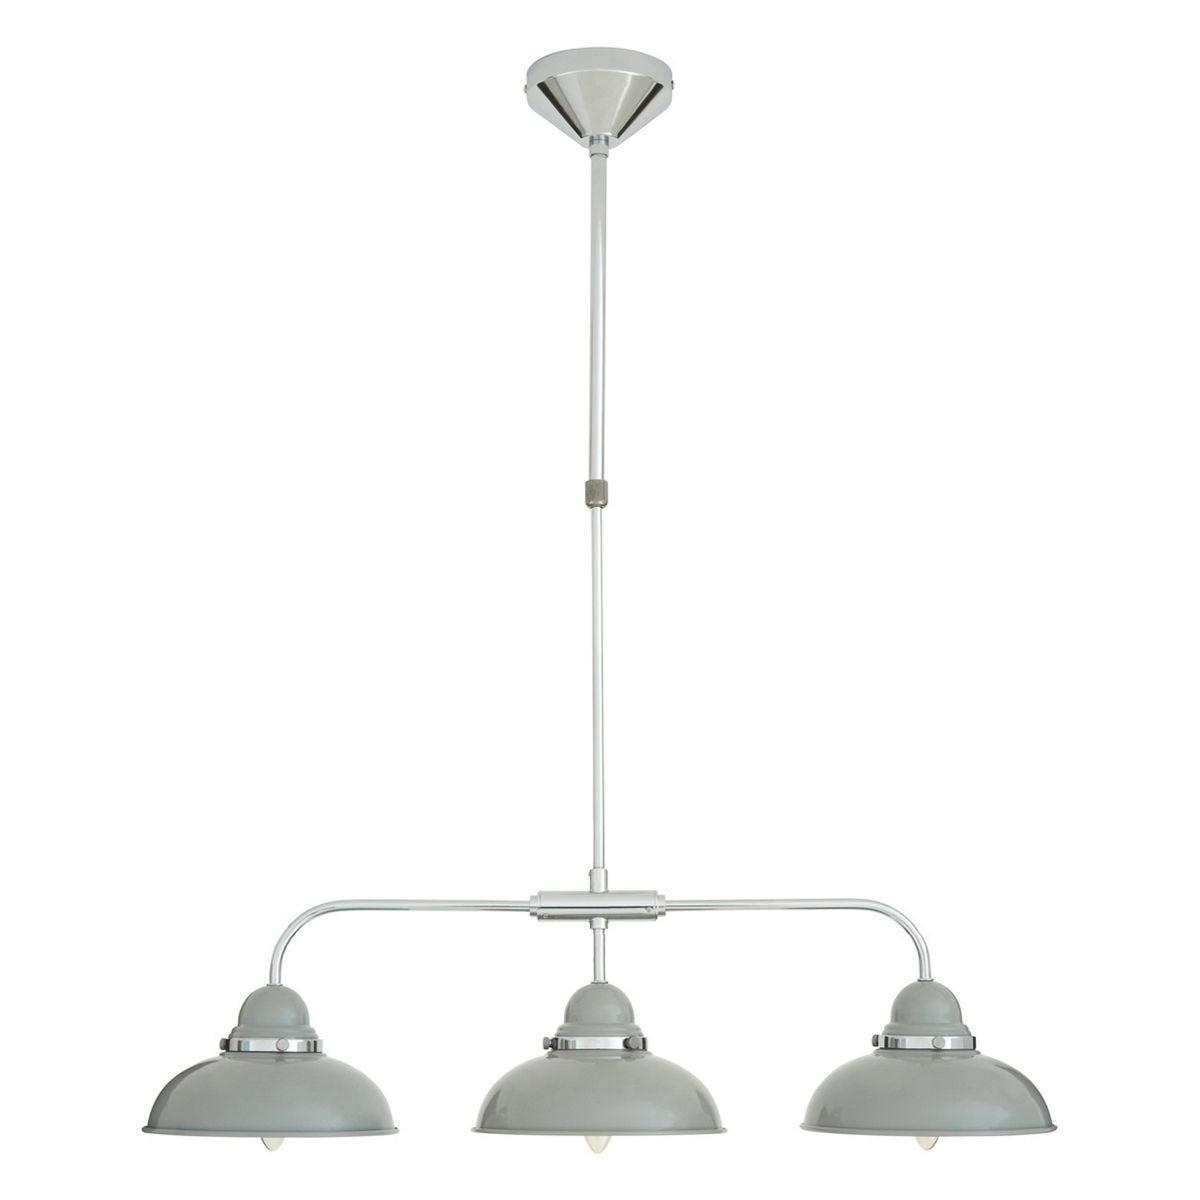 Pendant Light 3 Shades - Light Grey/Chrome